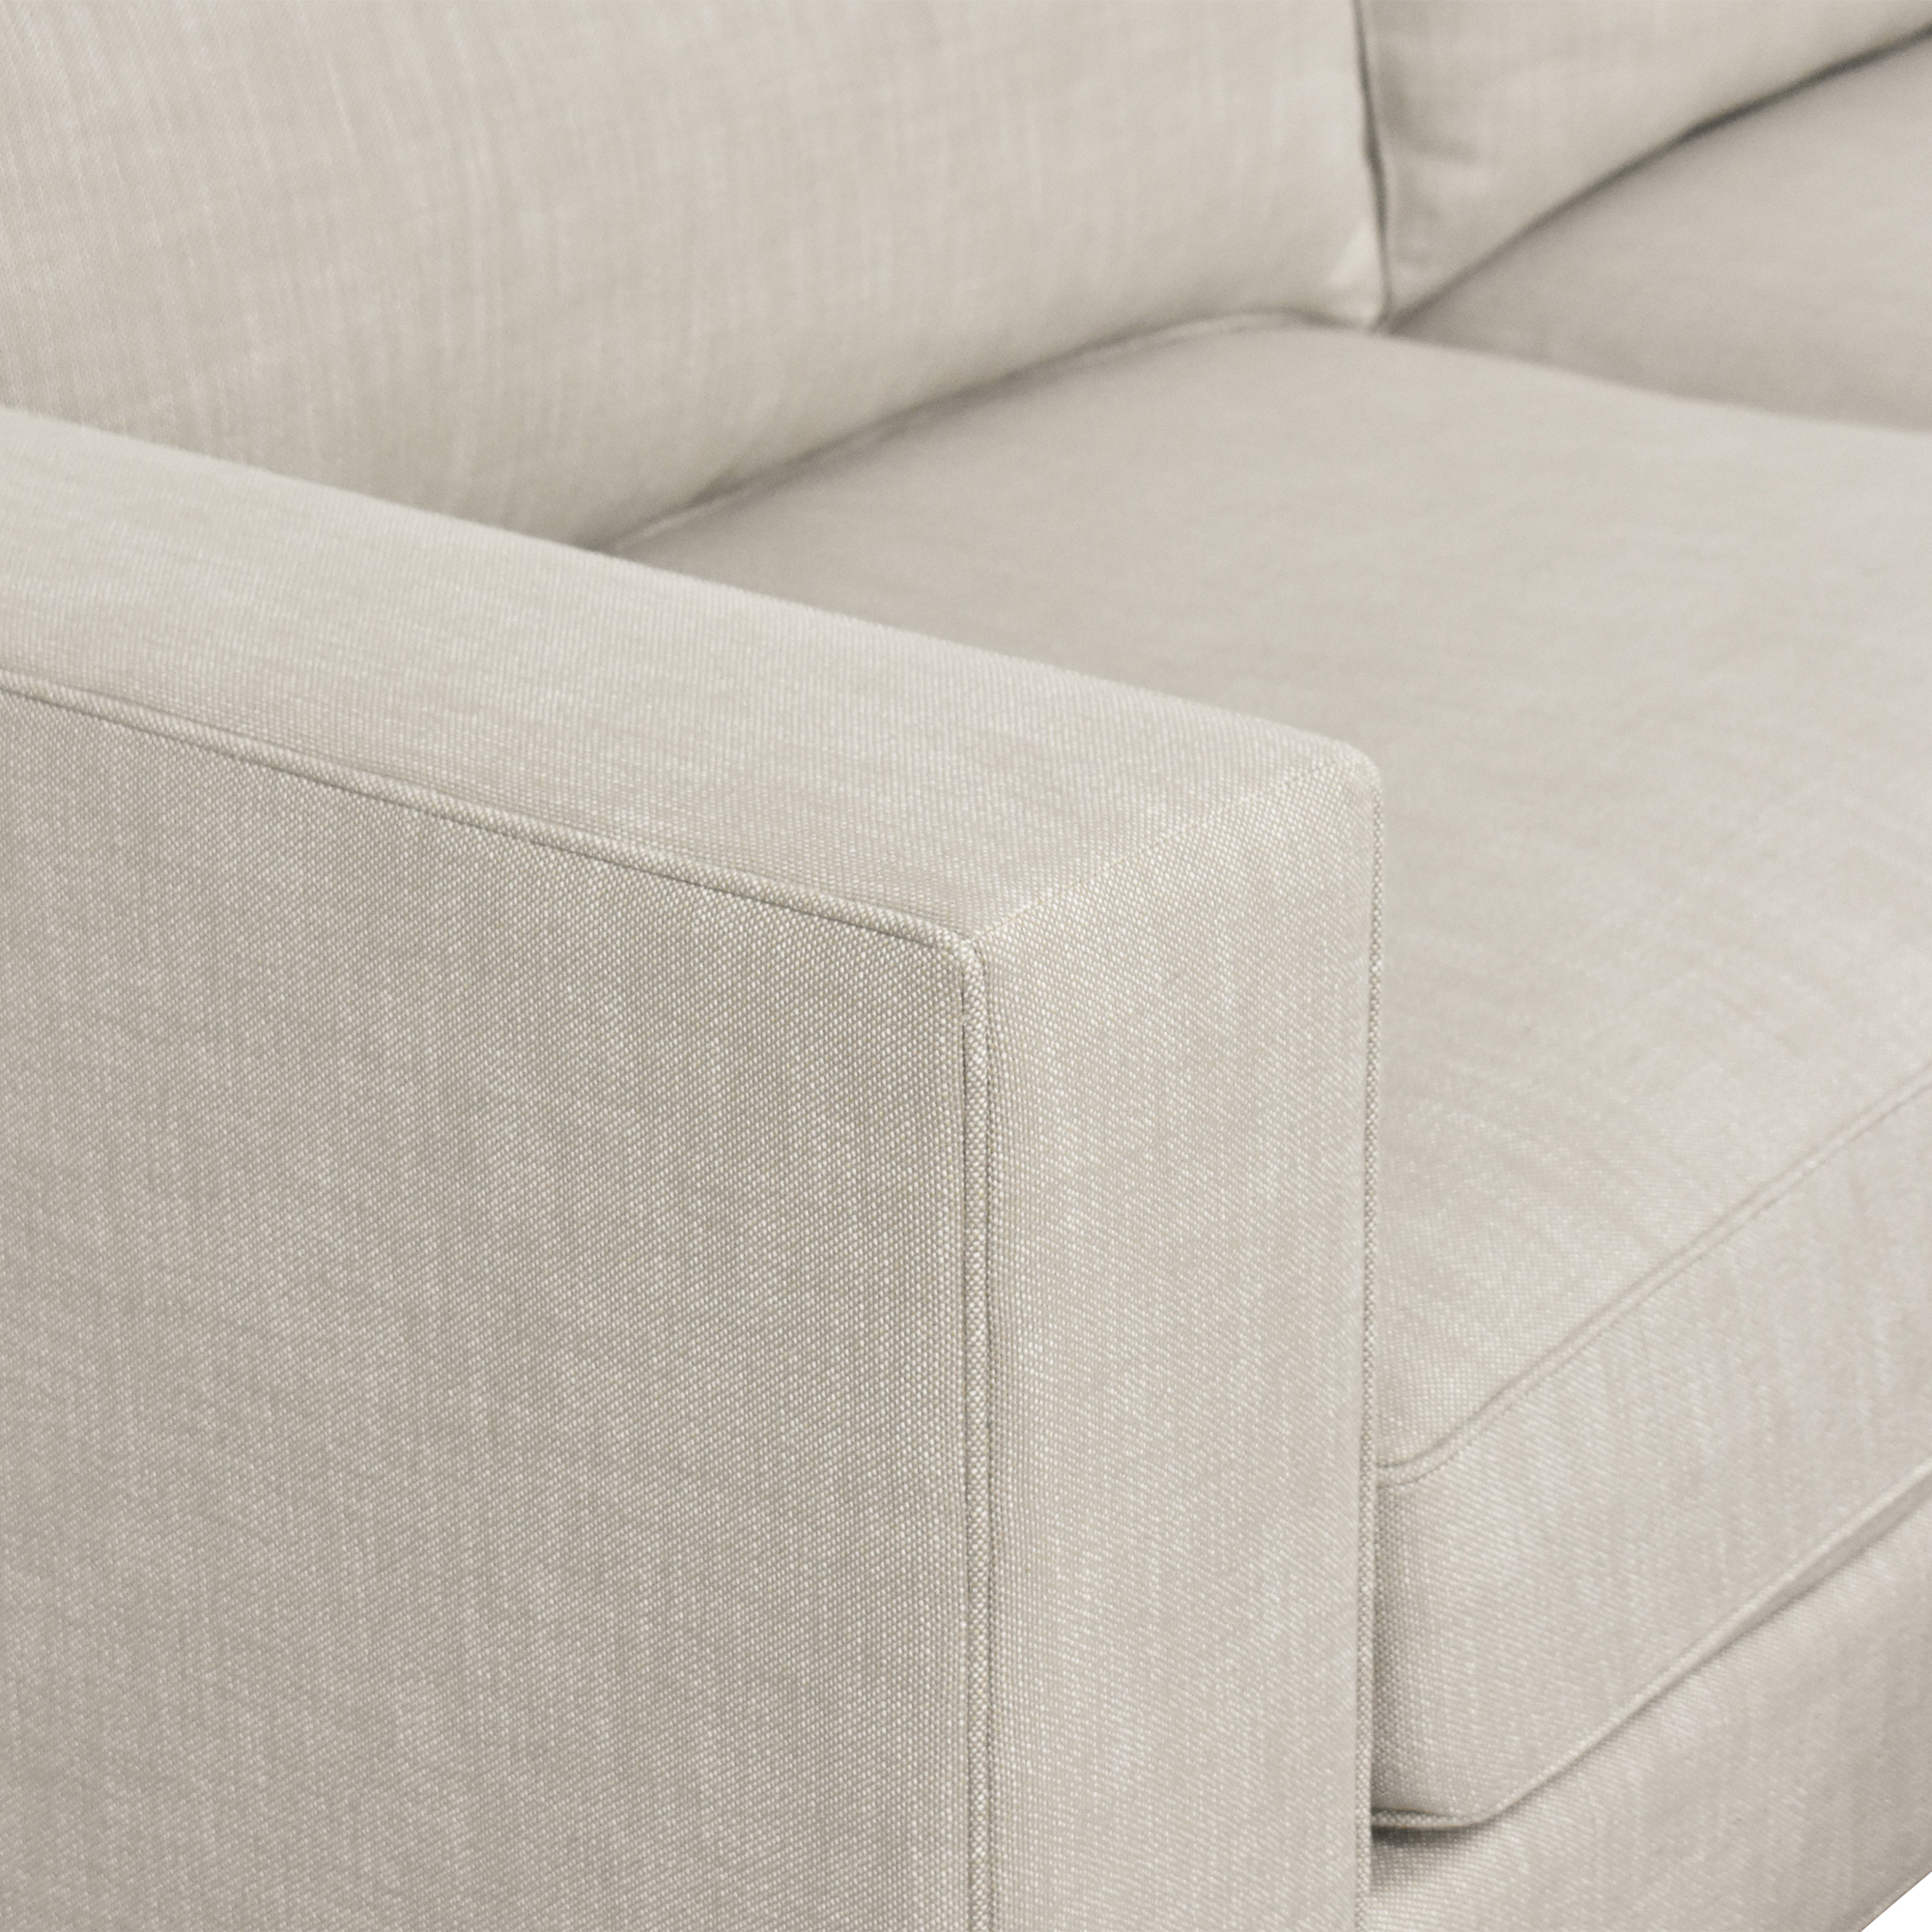 Restoration Hardware Restoration Hardware Maddox Sofa with Ottoman price